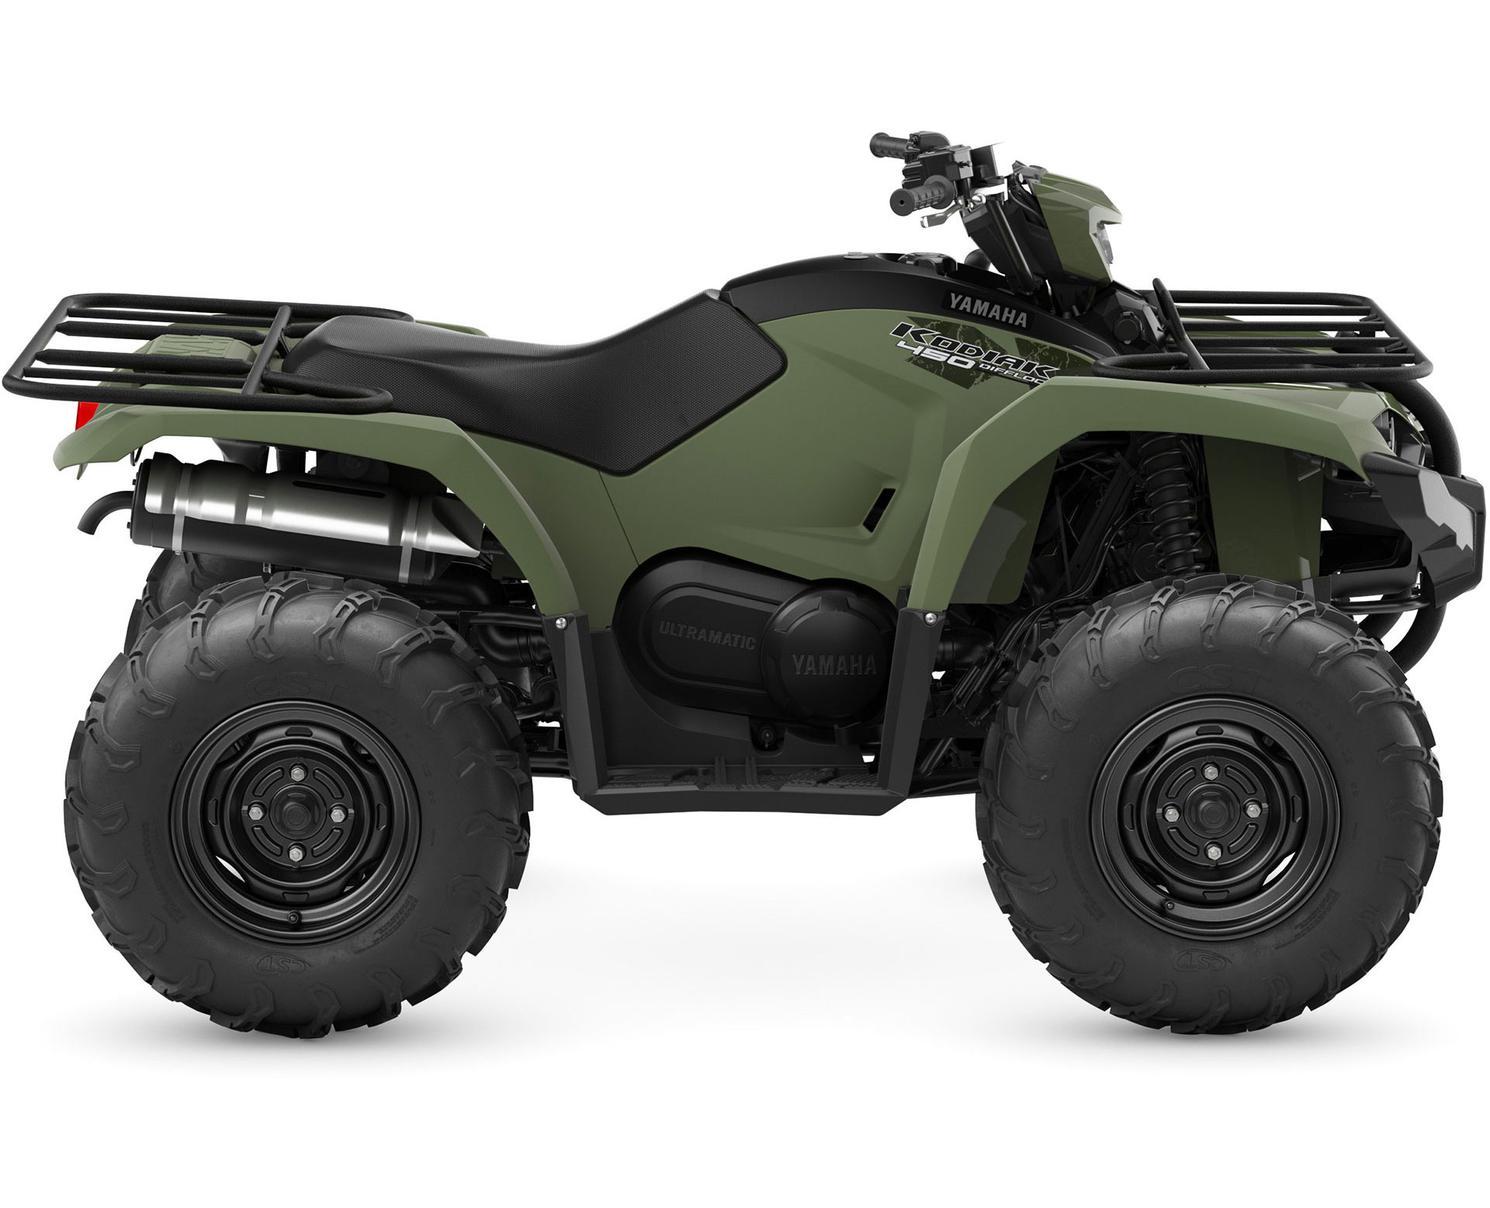 Yamaha Kodiak 450 EPS Vert Tactique 2022